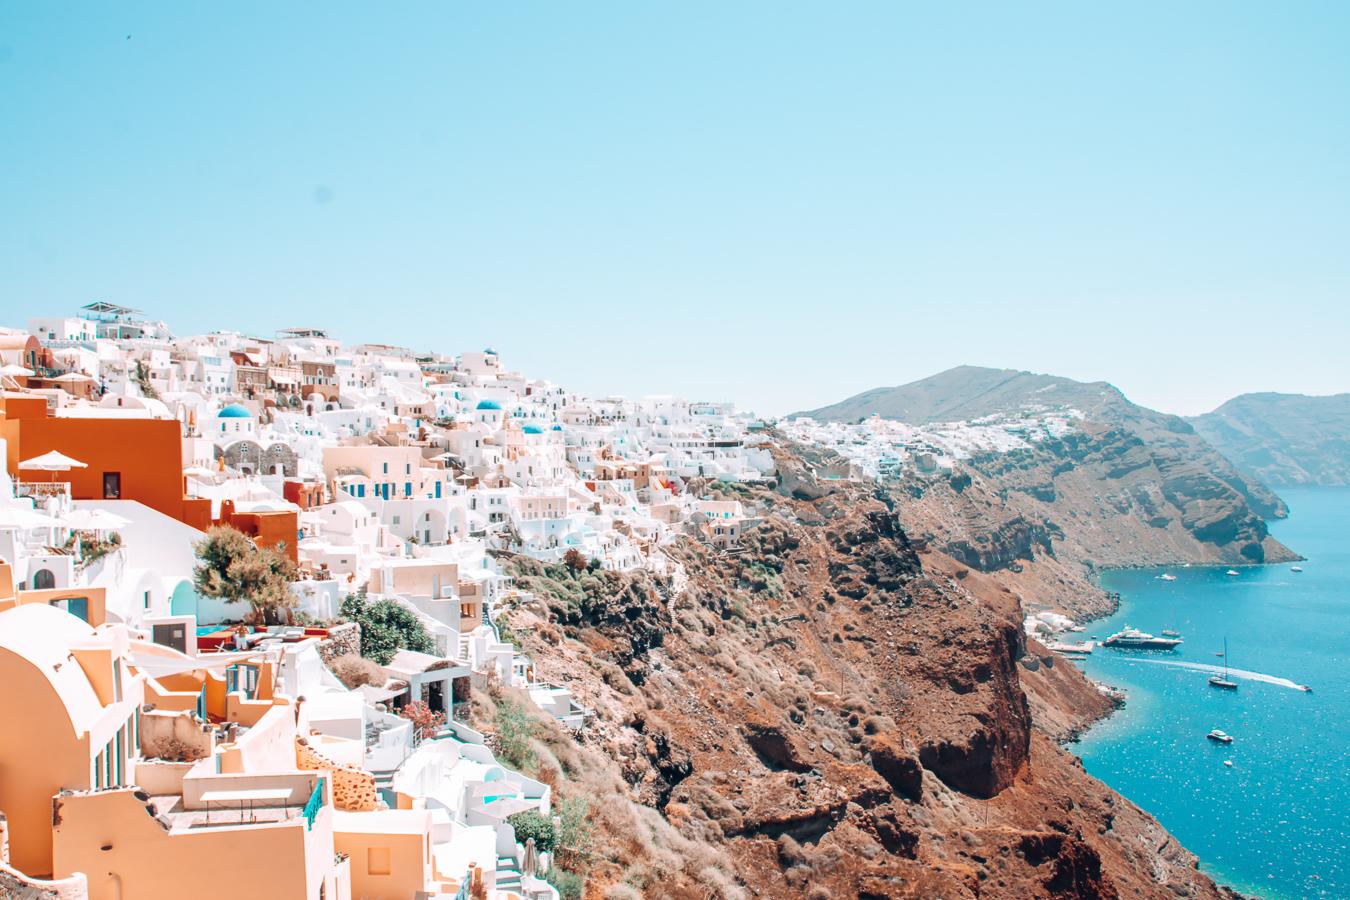 Village and sea